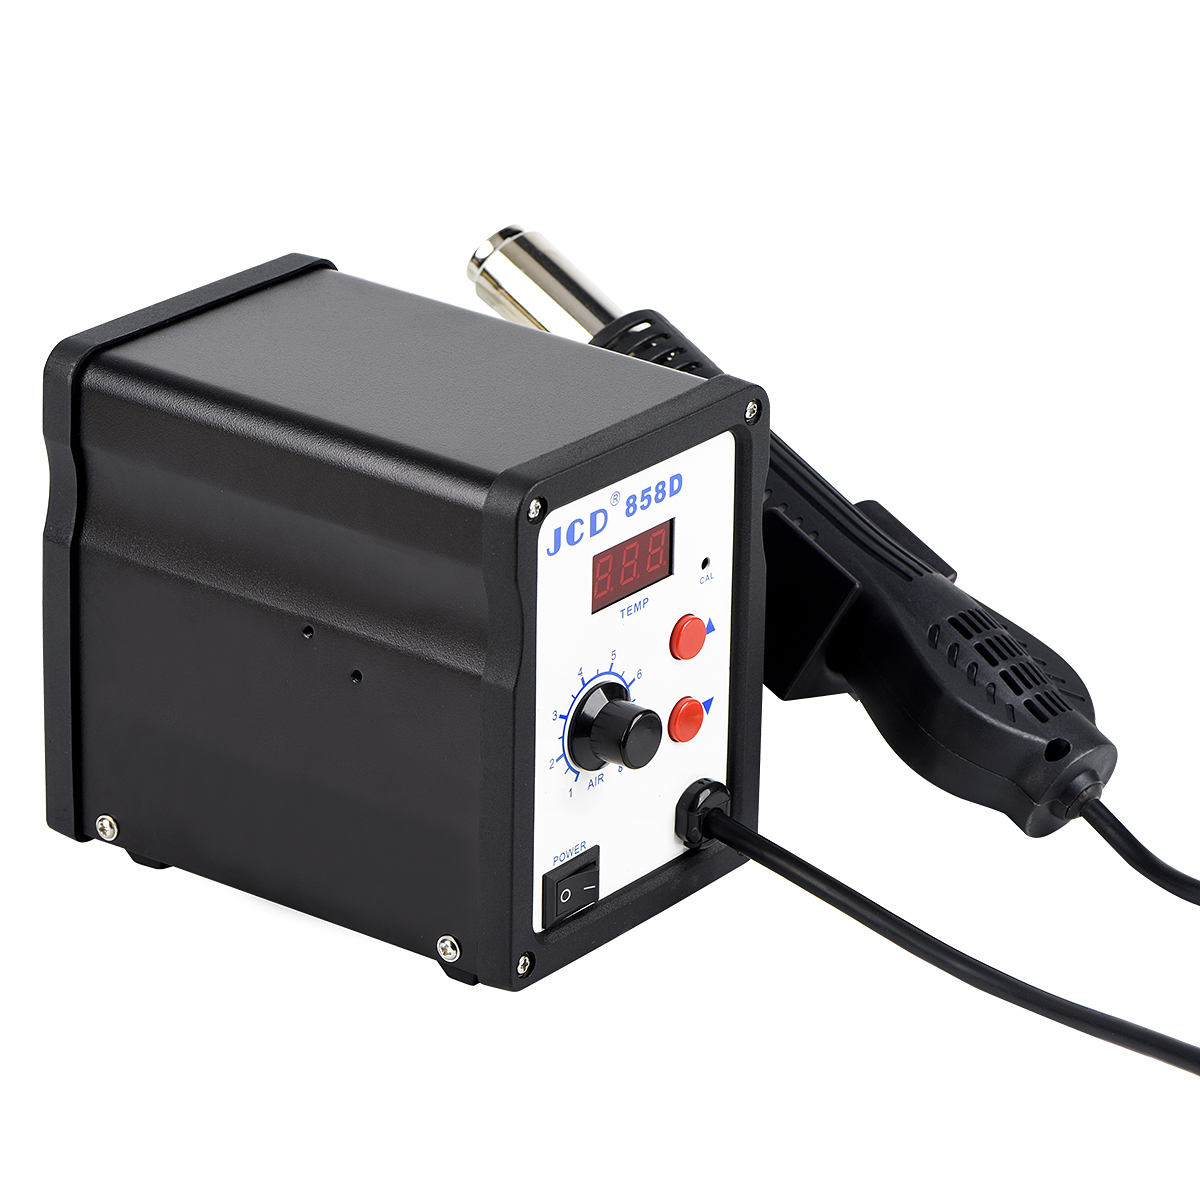 Top SaleJCD Repair-Tool Heat-Gun Rework Soldering-Station-700w Welding 110V 858D Digital LED